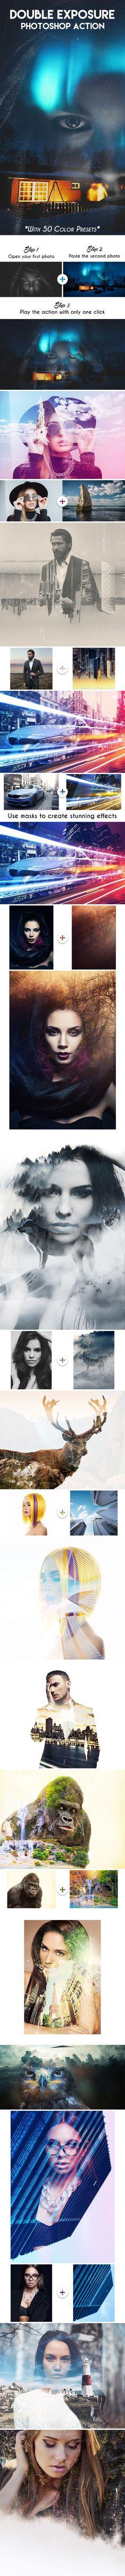 Double Exposure Photoshop Action  #elegance #fade #duotone #digital • Download ➝ https://graphicriver.net/item/double-exposure-photoshop-action/17424700?ref=rabosch